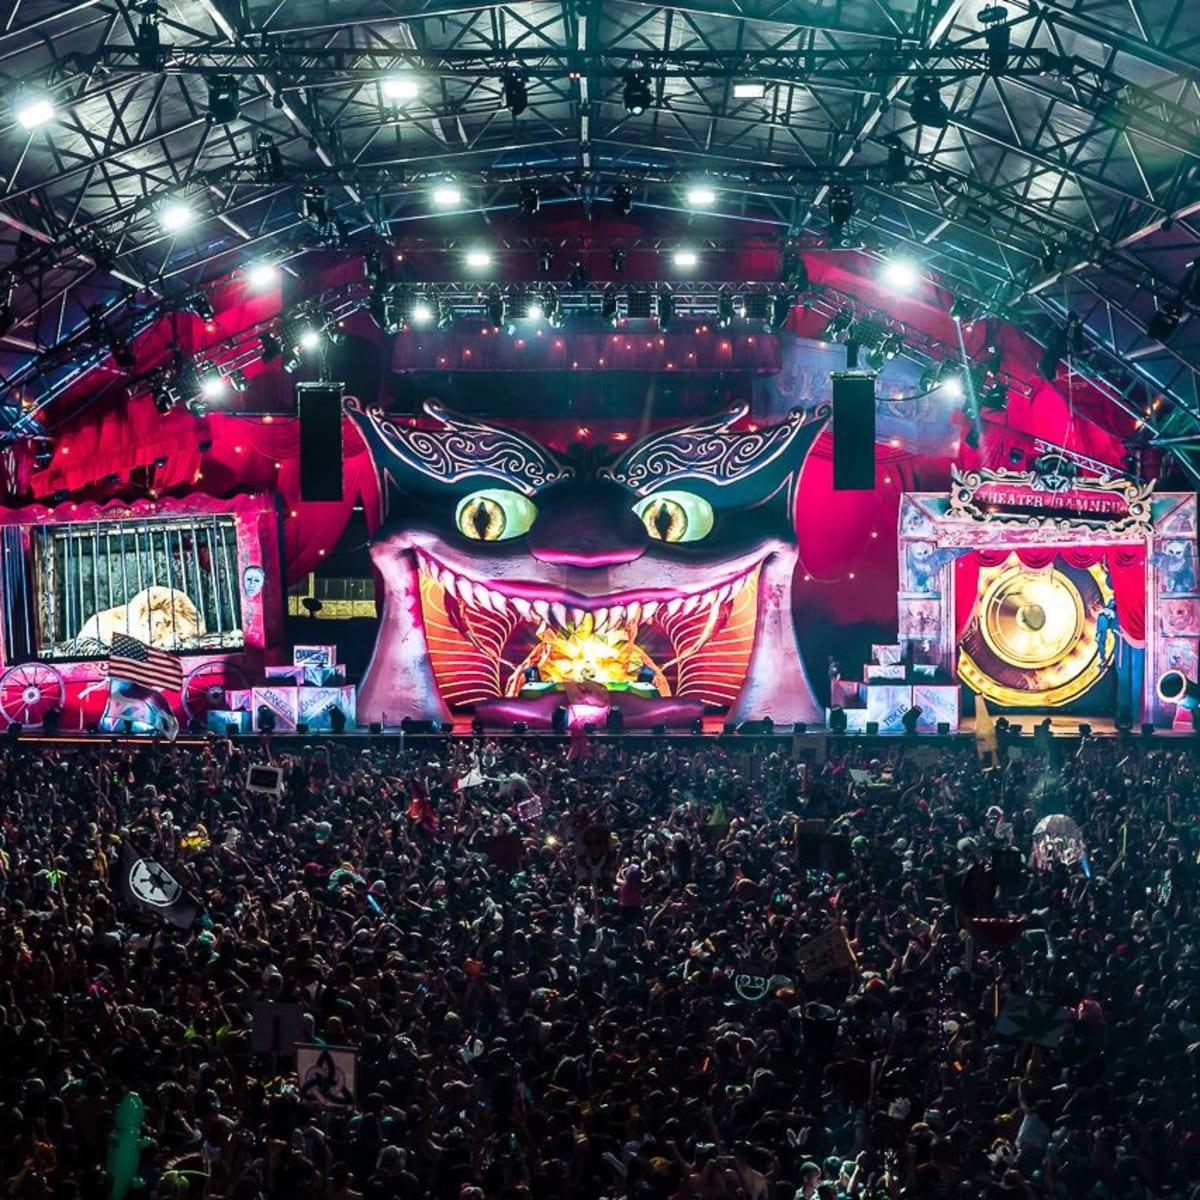 Halloween Festivals 2020 Edm Insomniac Announces Escape: Psycho Circus 2020   EDM.  The